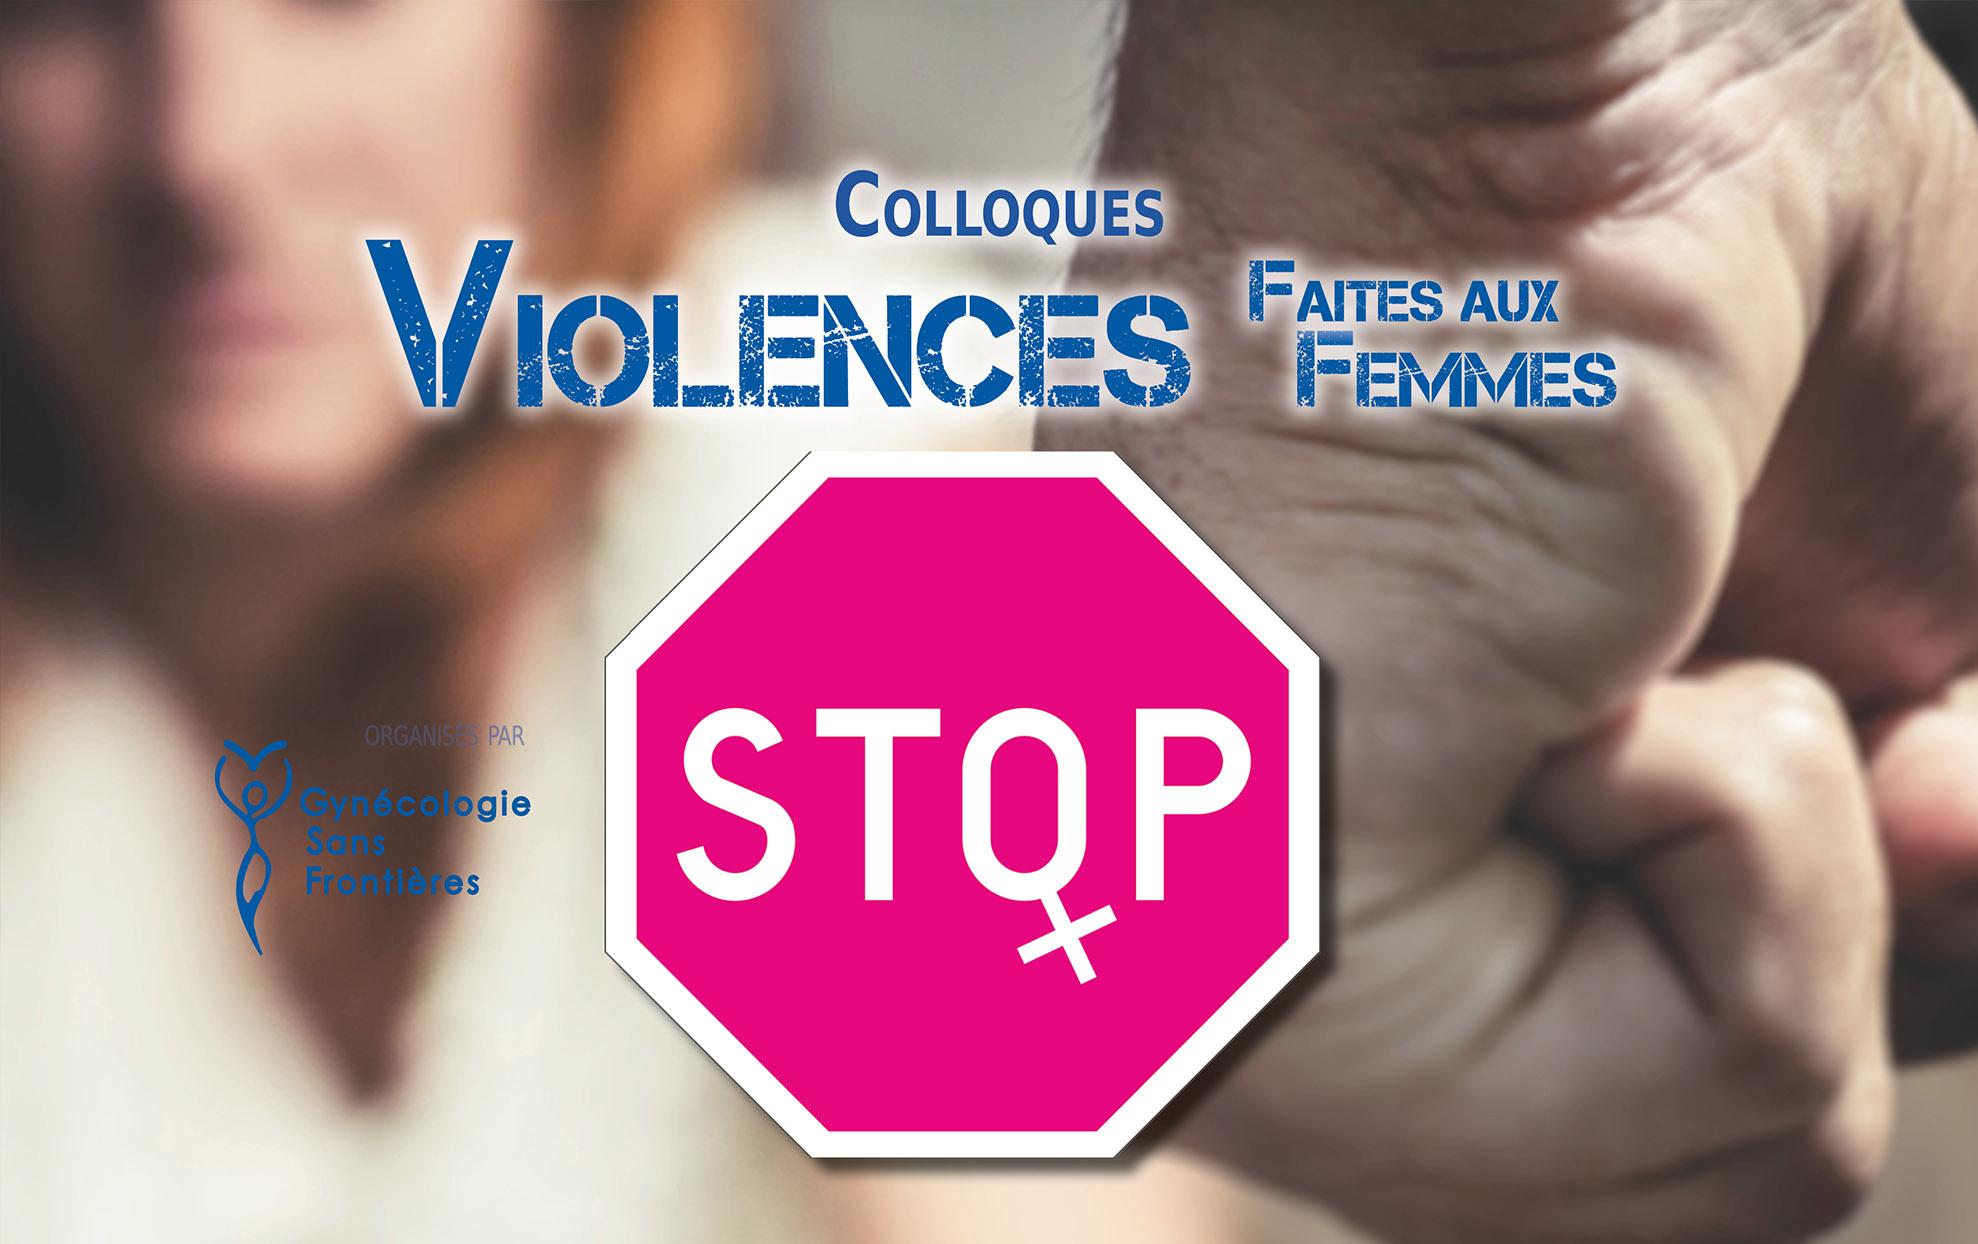 Colloque La Ciotat (13) Violences faites aux femmes – Jeudi 4 novembre 2021